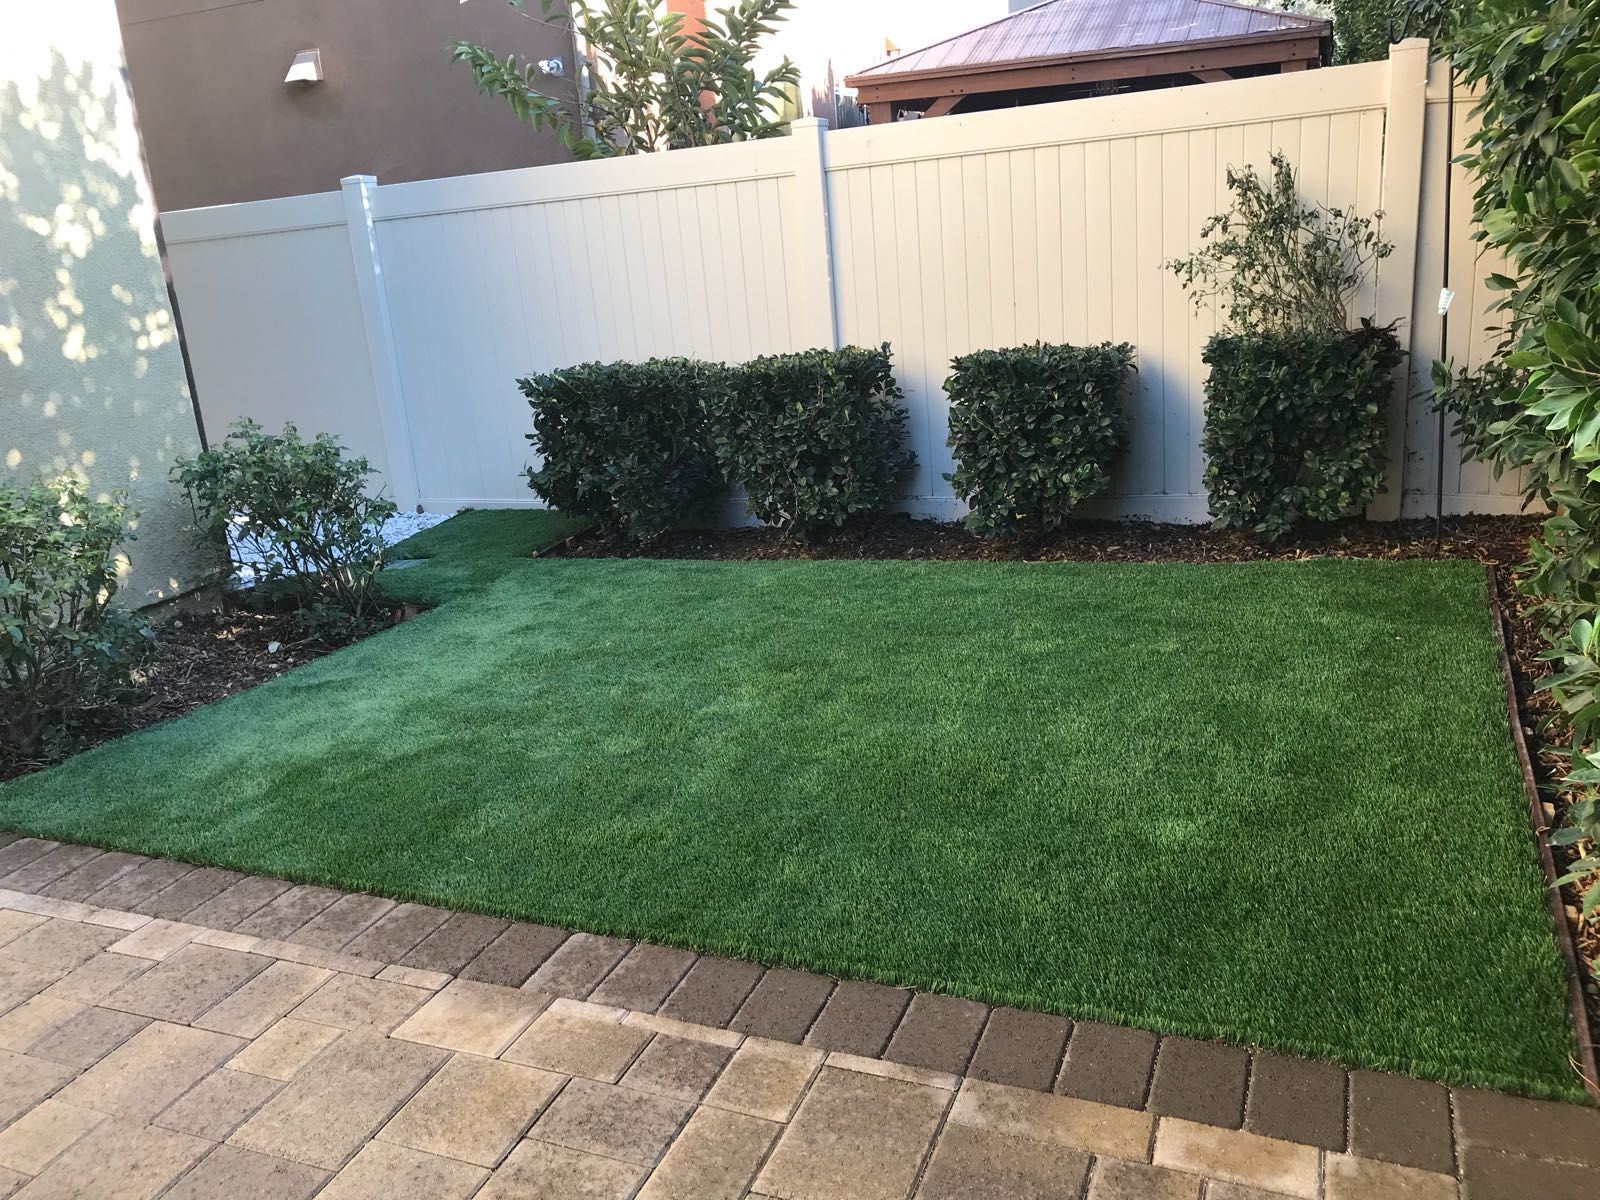 Paver Installation | Backyard renovations, Energy ... on Backyard Renovation Companies id=86602